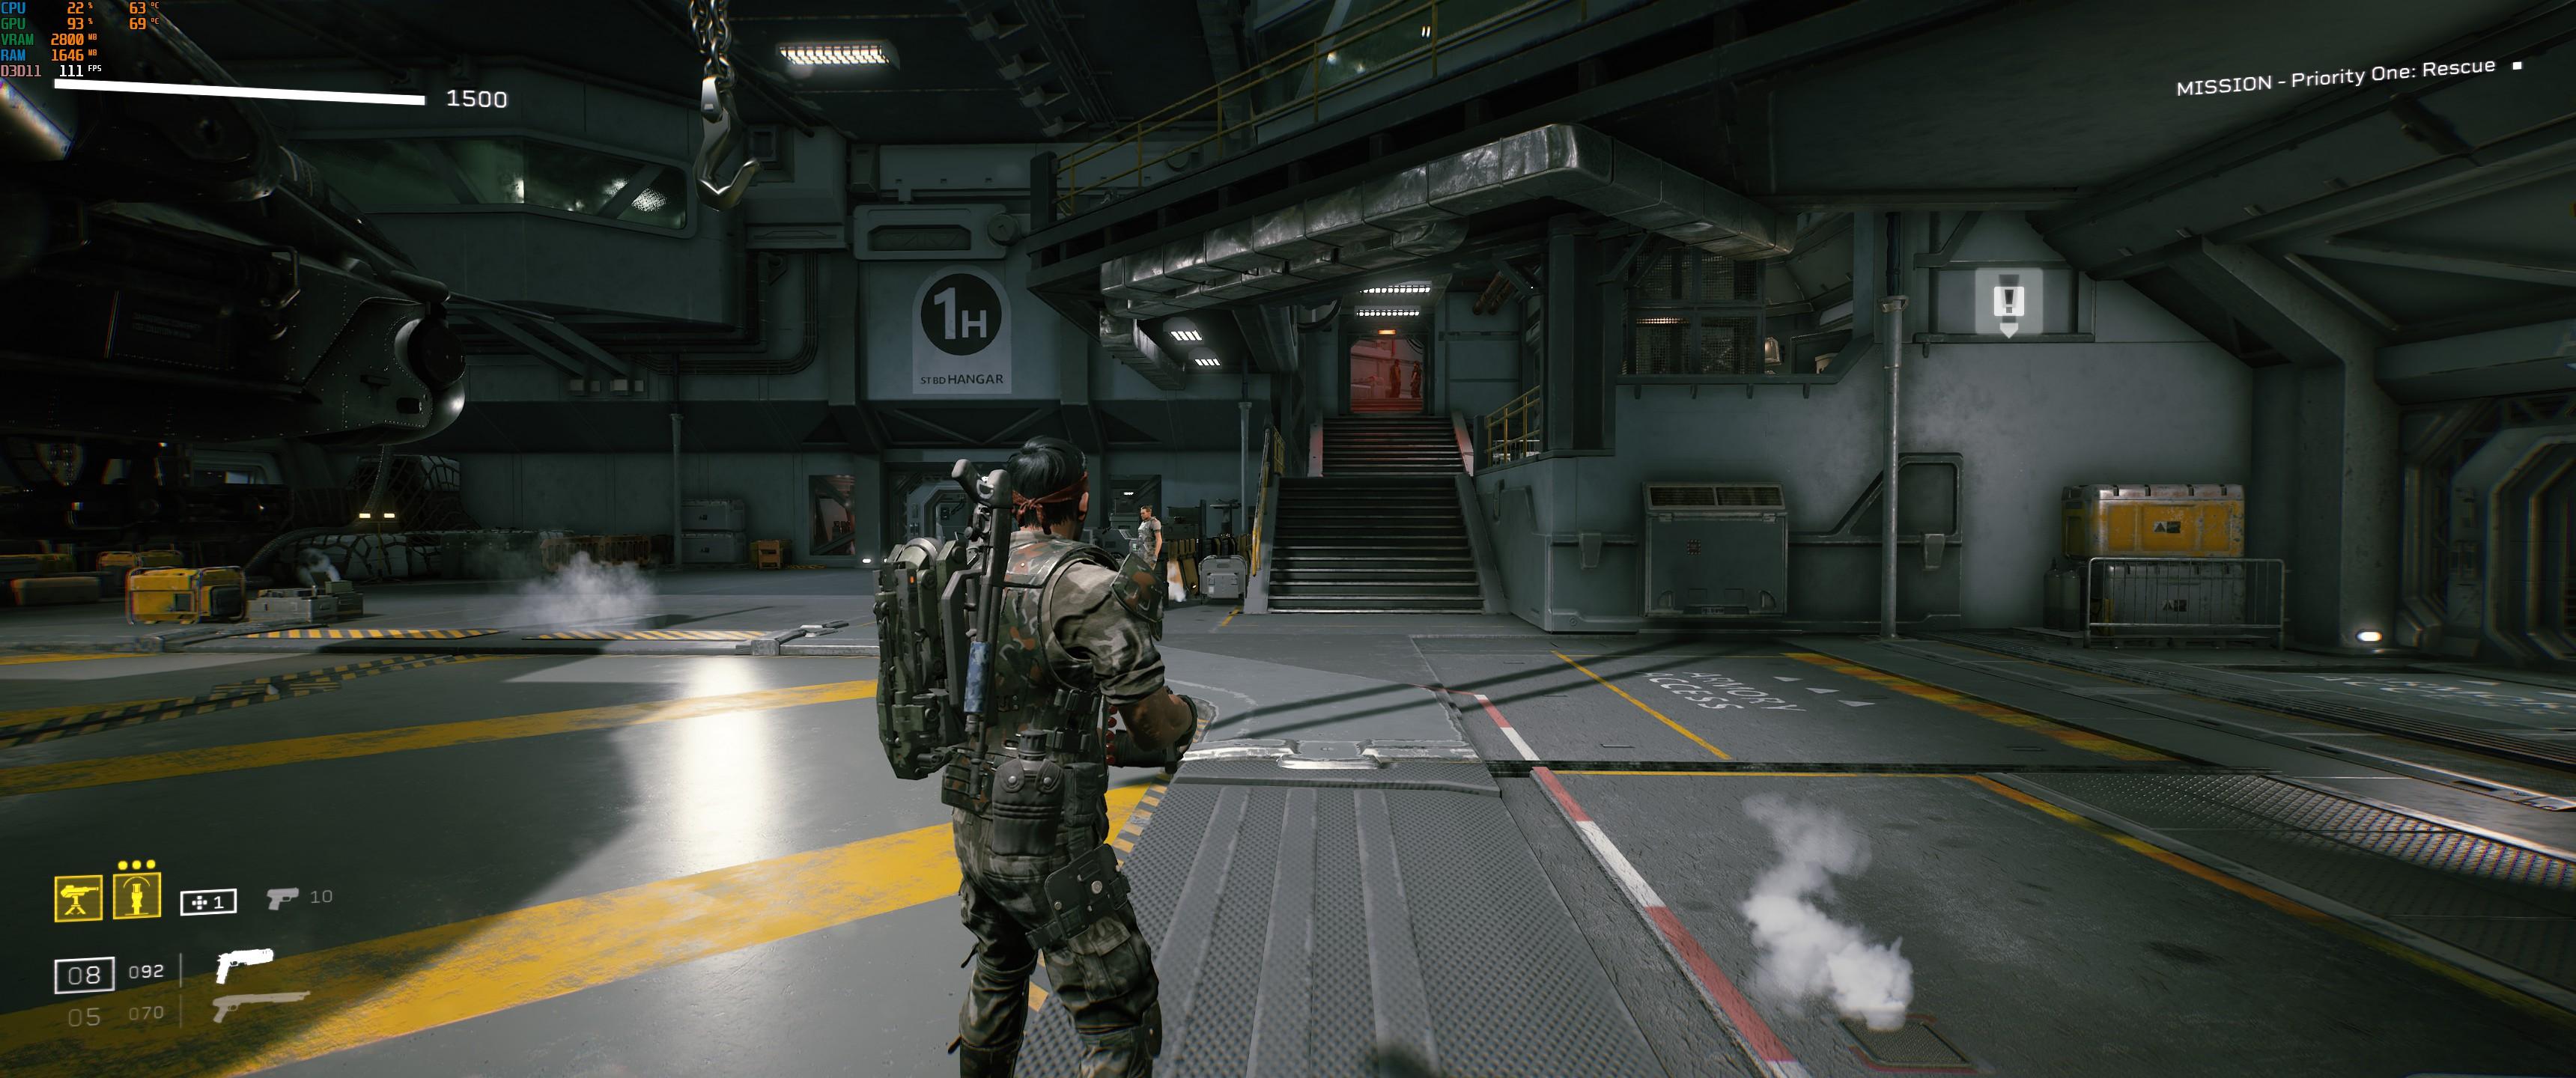 Aliens: Fireteam Elite - How to adjust the FOV - Example FOV - 41C1224